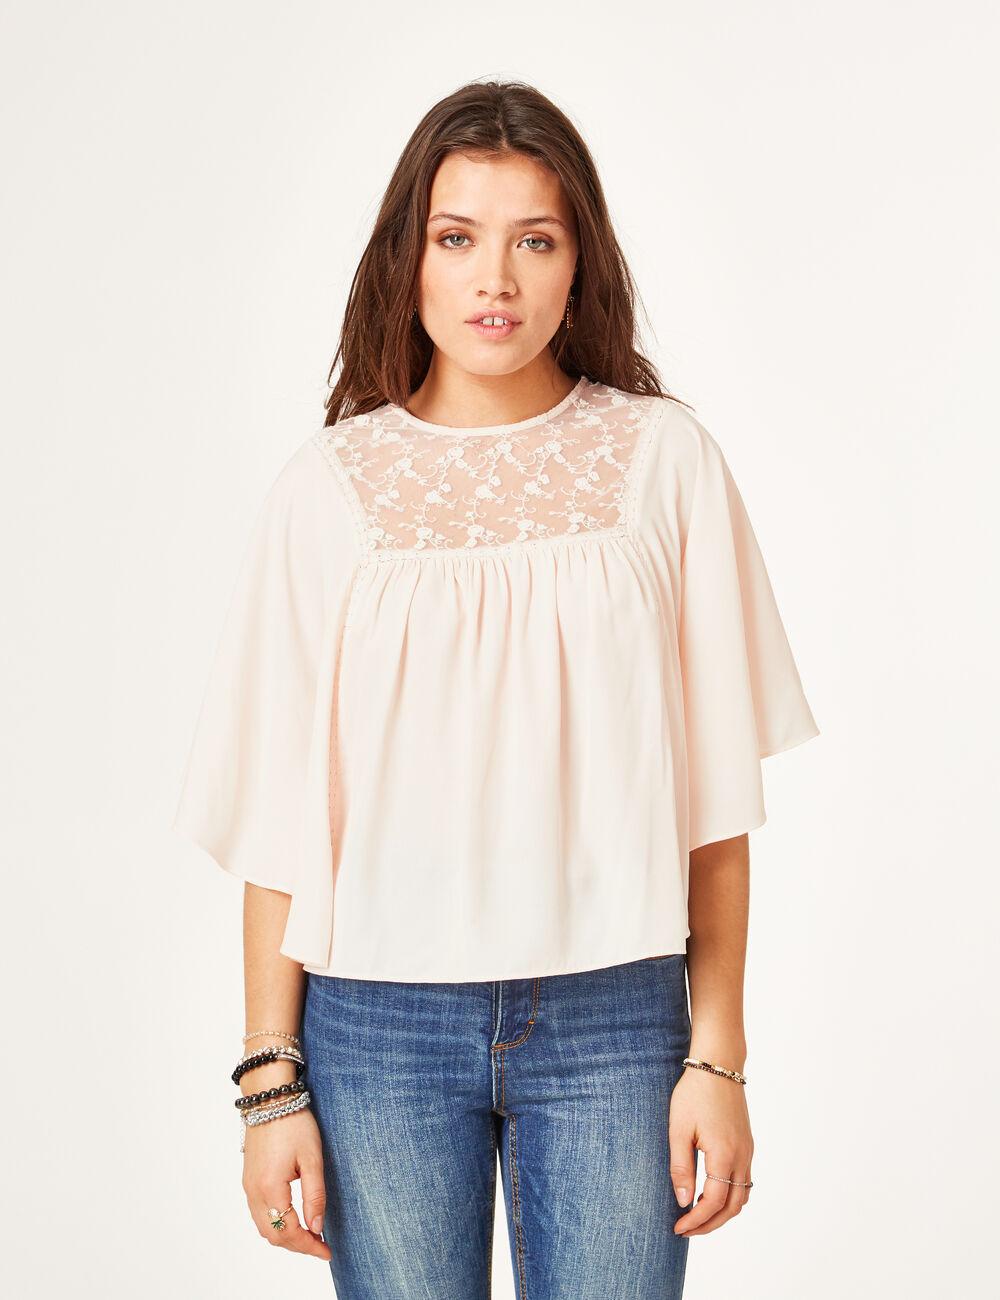 blouse avec dentelle rose clair femme jennyfer. Black Bedroom Furniture Sets. Home Design Ideas